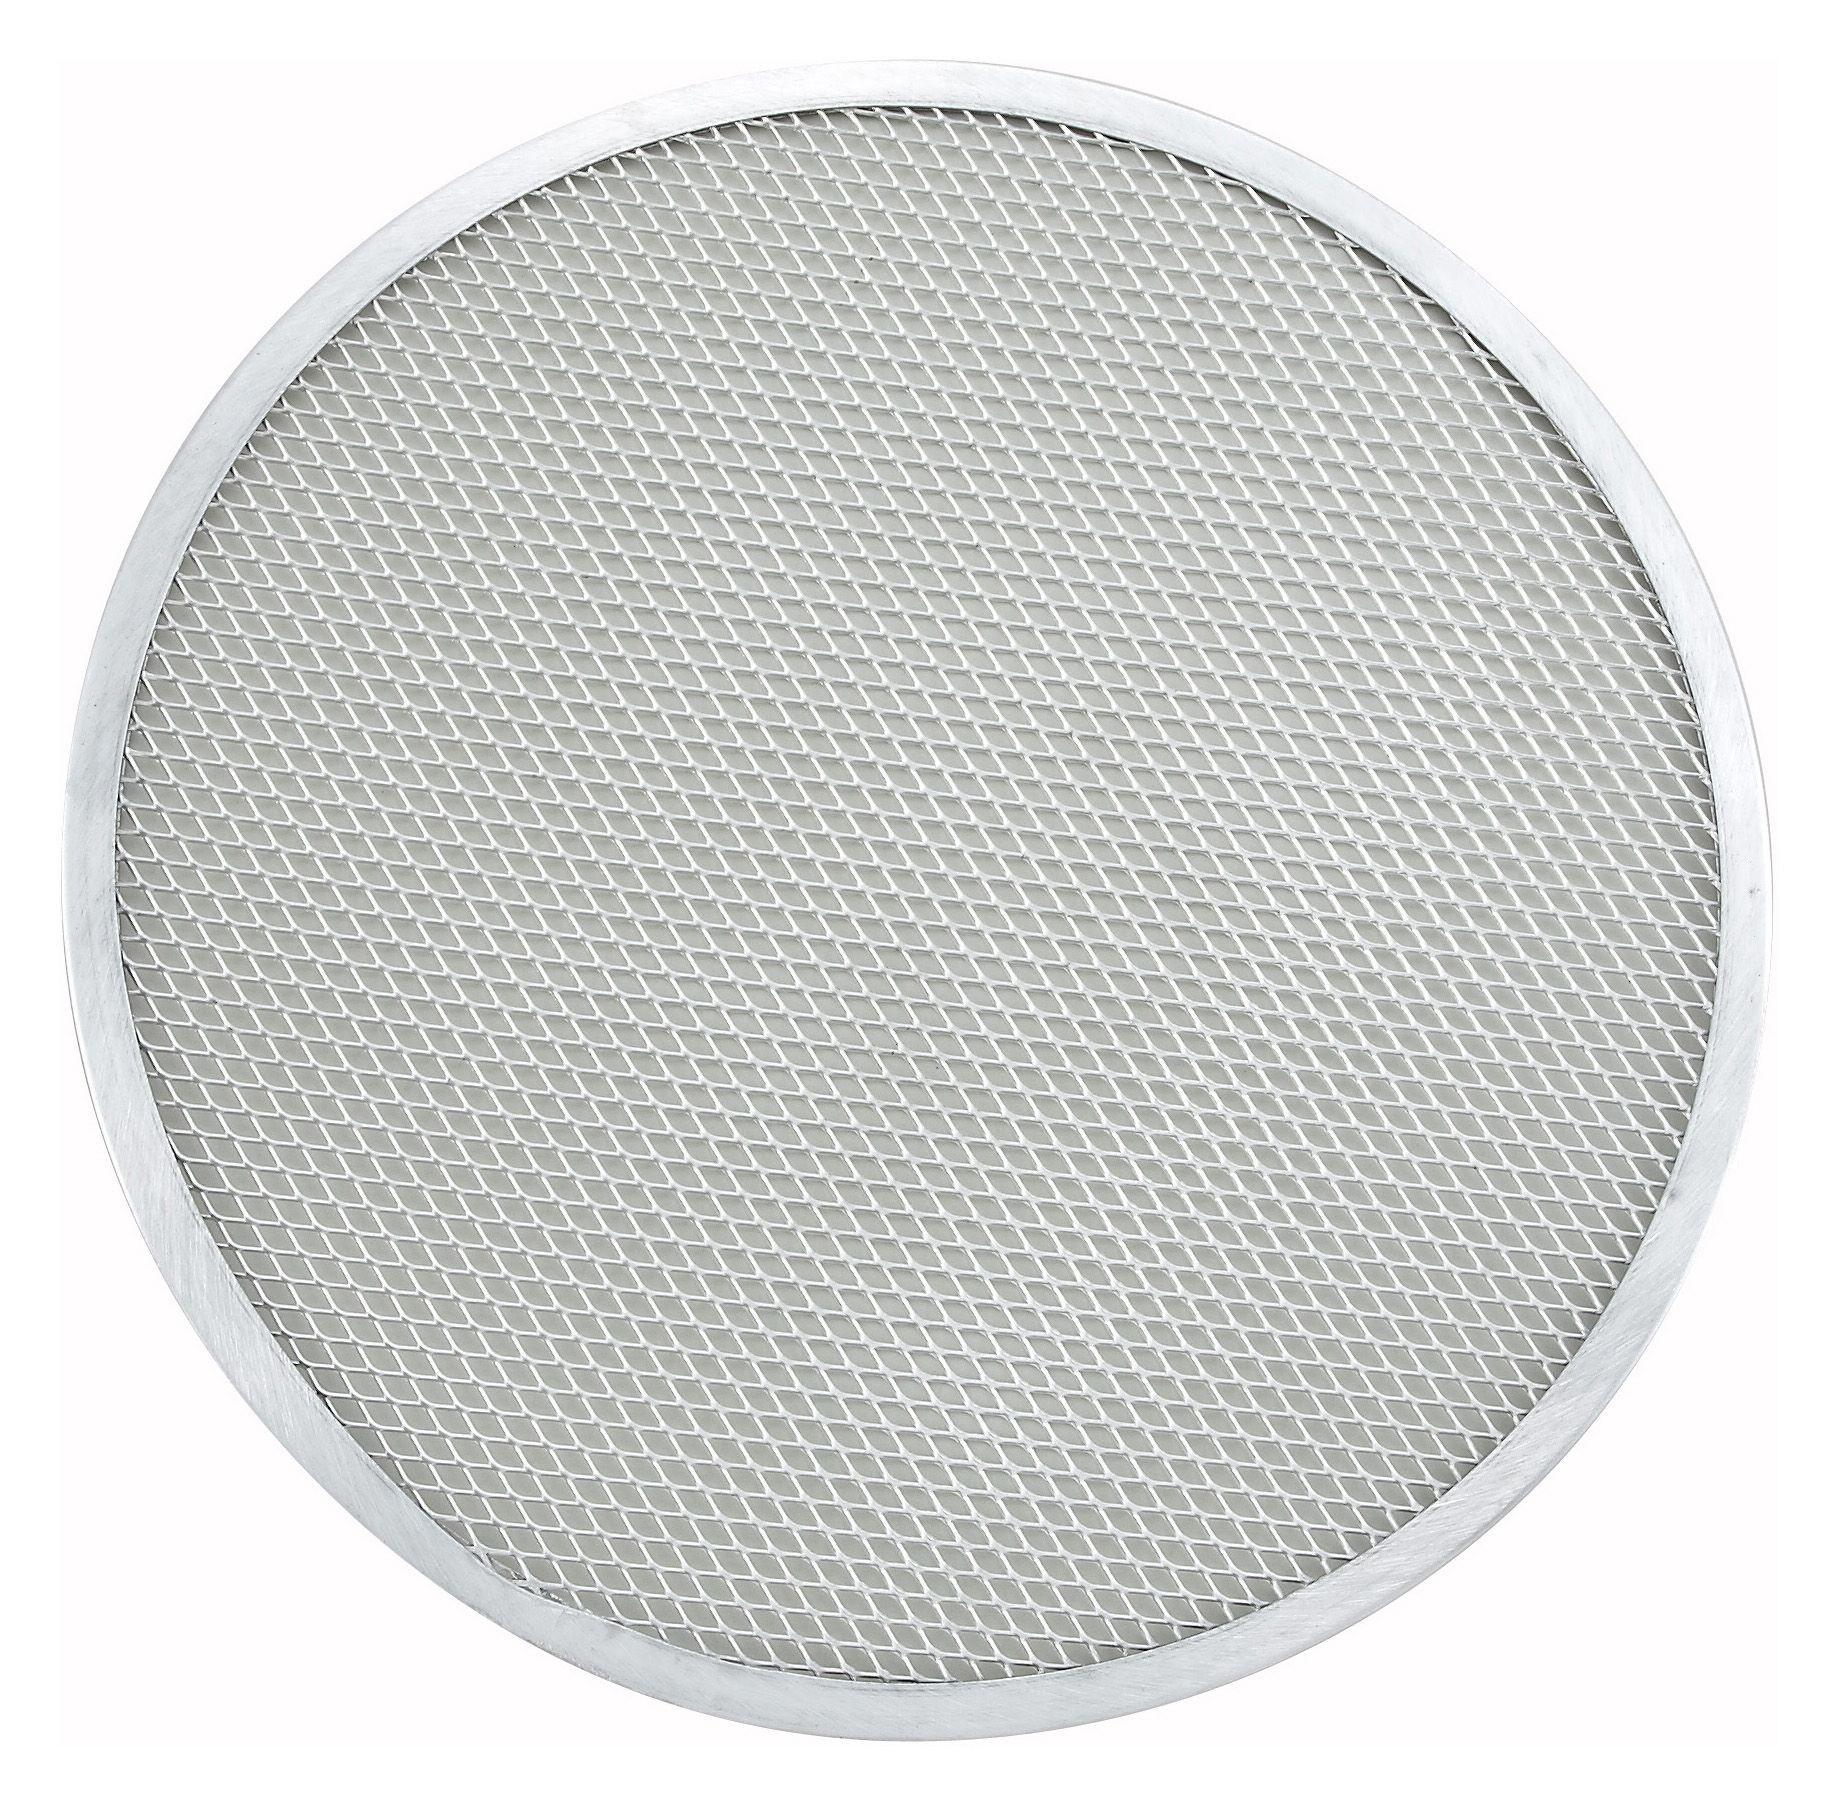 "Winco apzs-14 Seamless Aluminum Pizza Screen 14"" Dia."